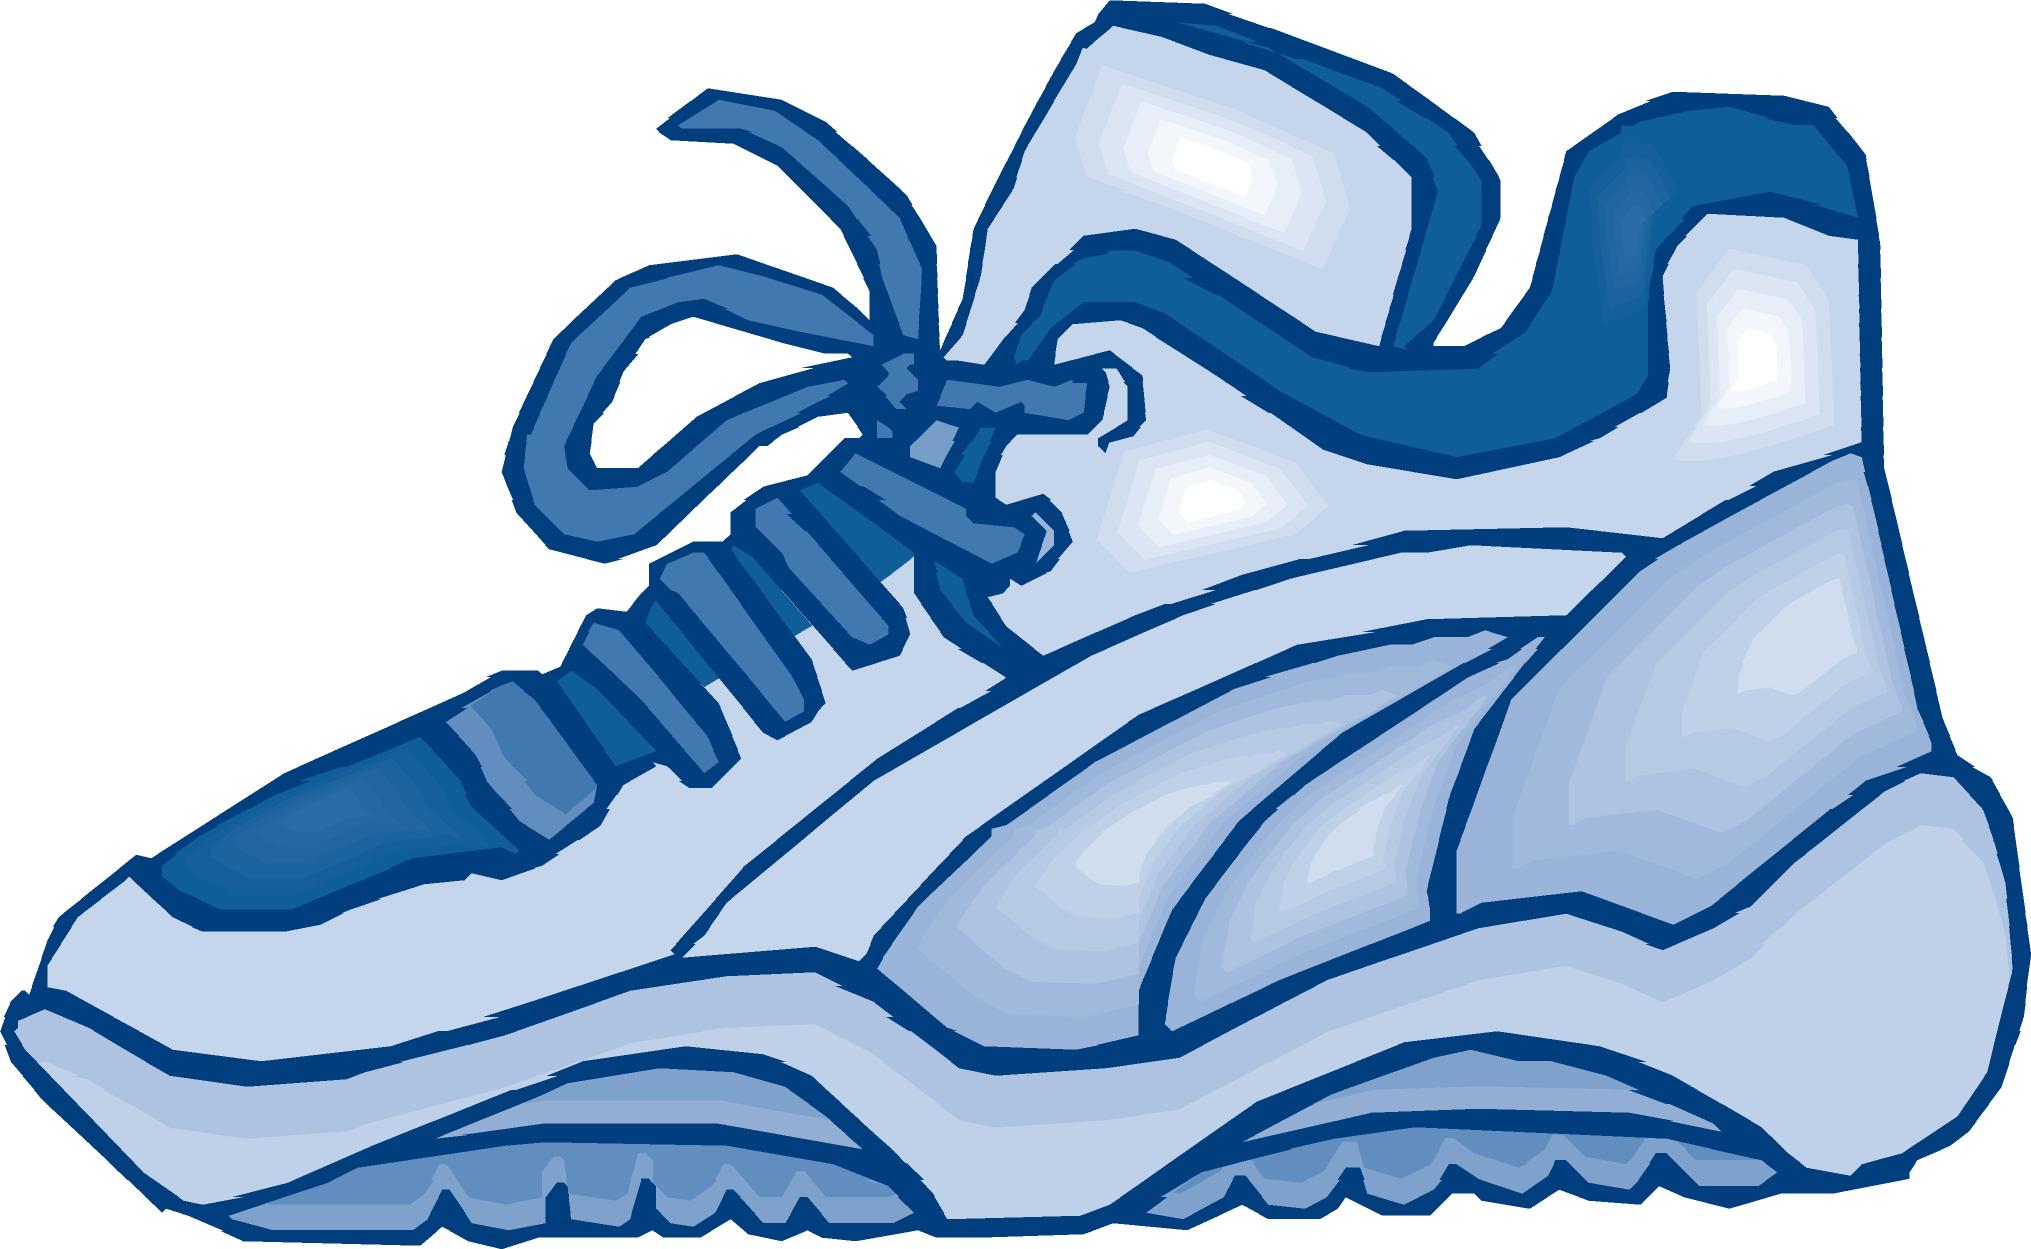 Sneaker Clipart & Sneaker Clip Art Images.